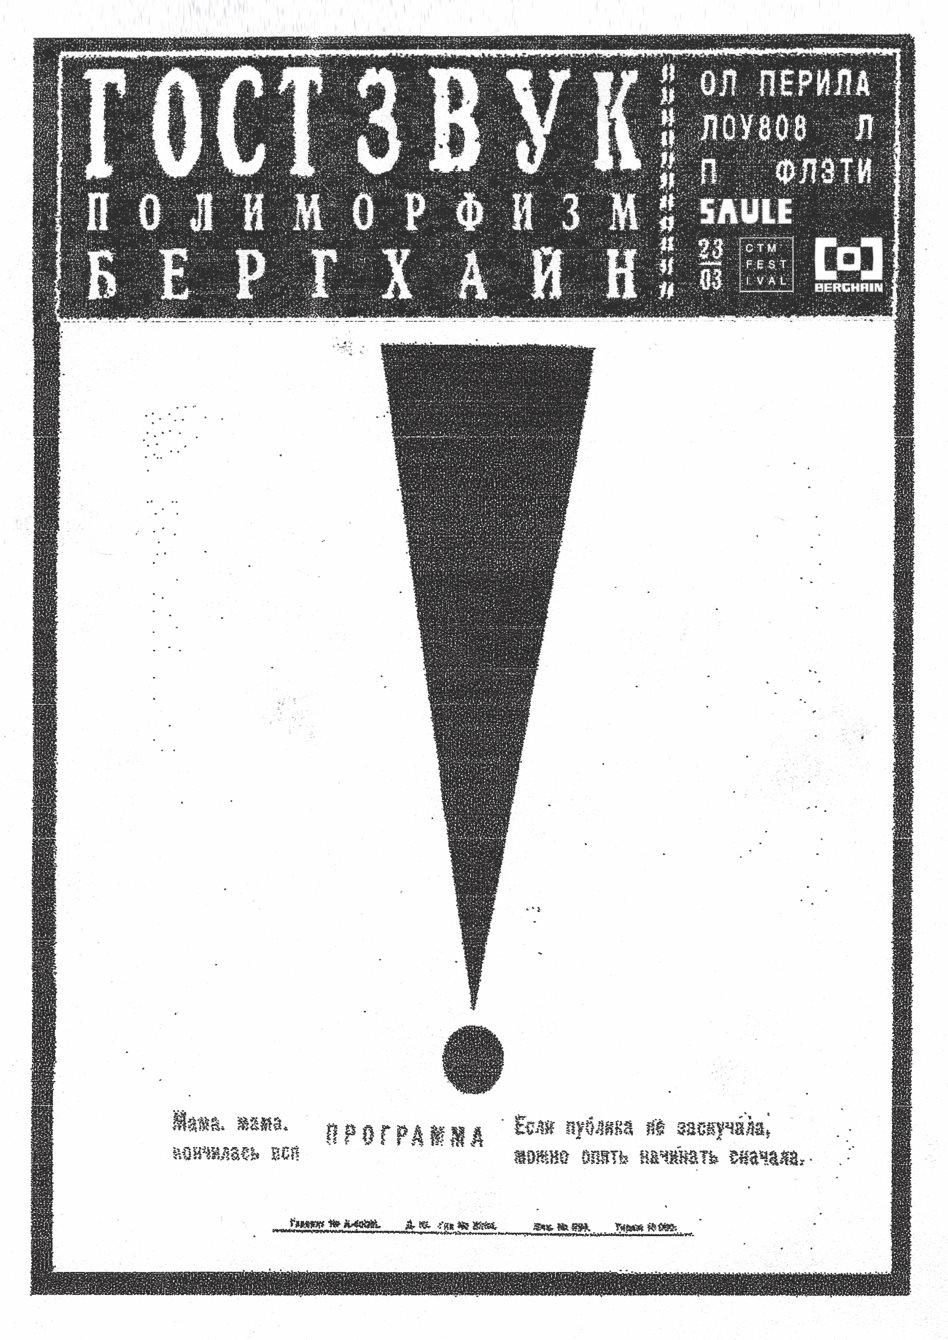 Polymorphism X Gost Zvuk - Flyer back